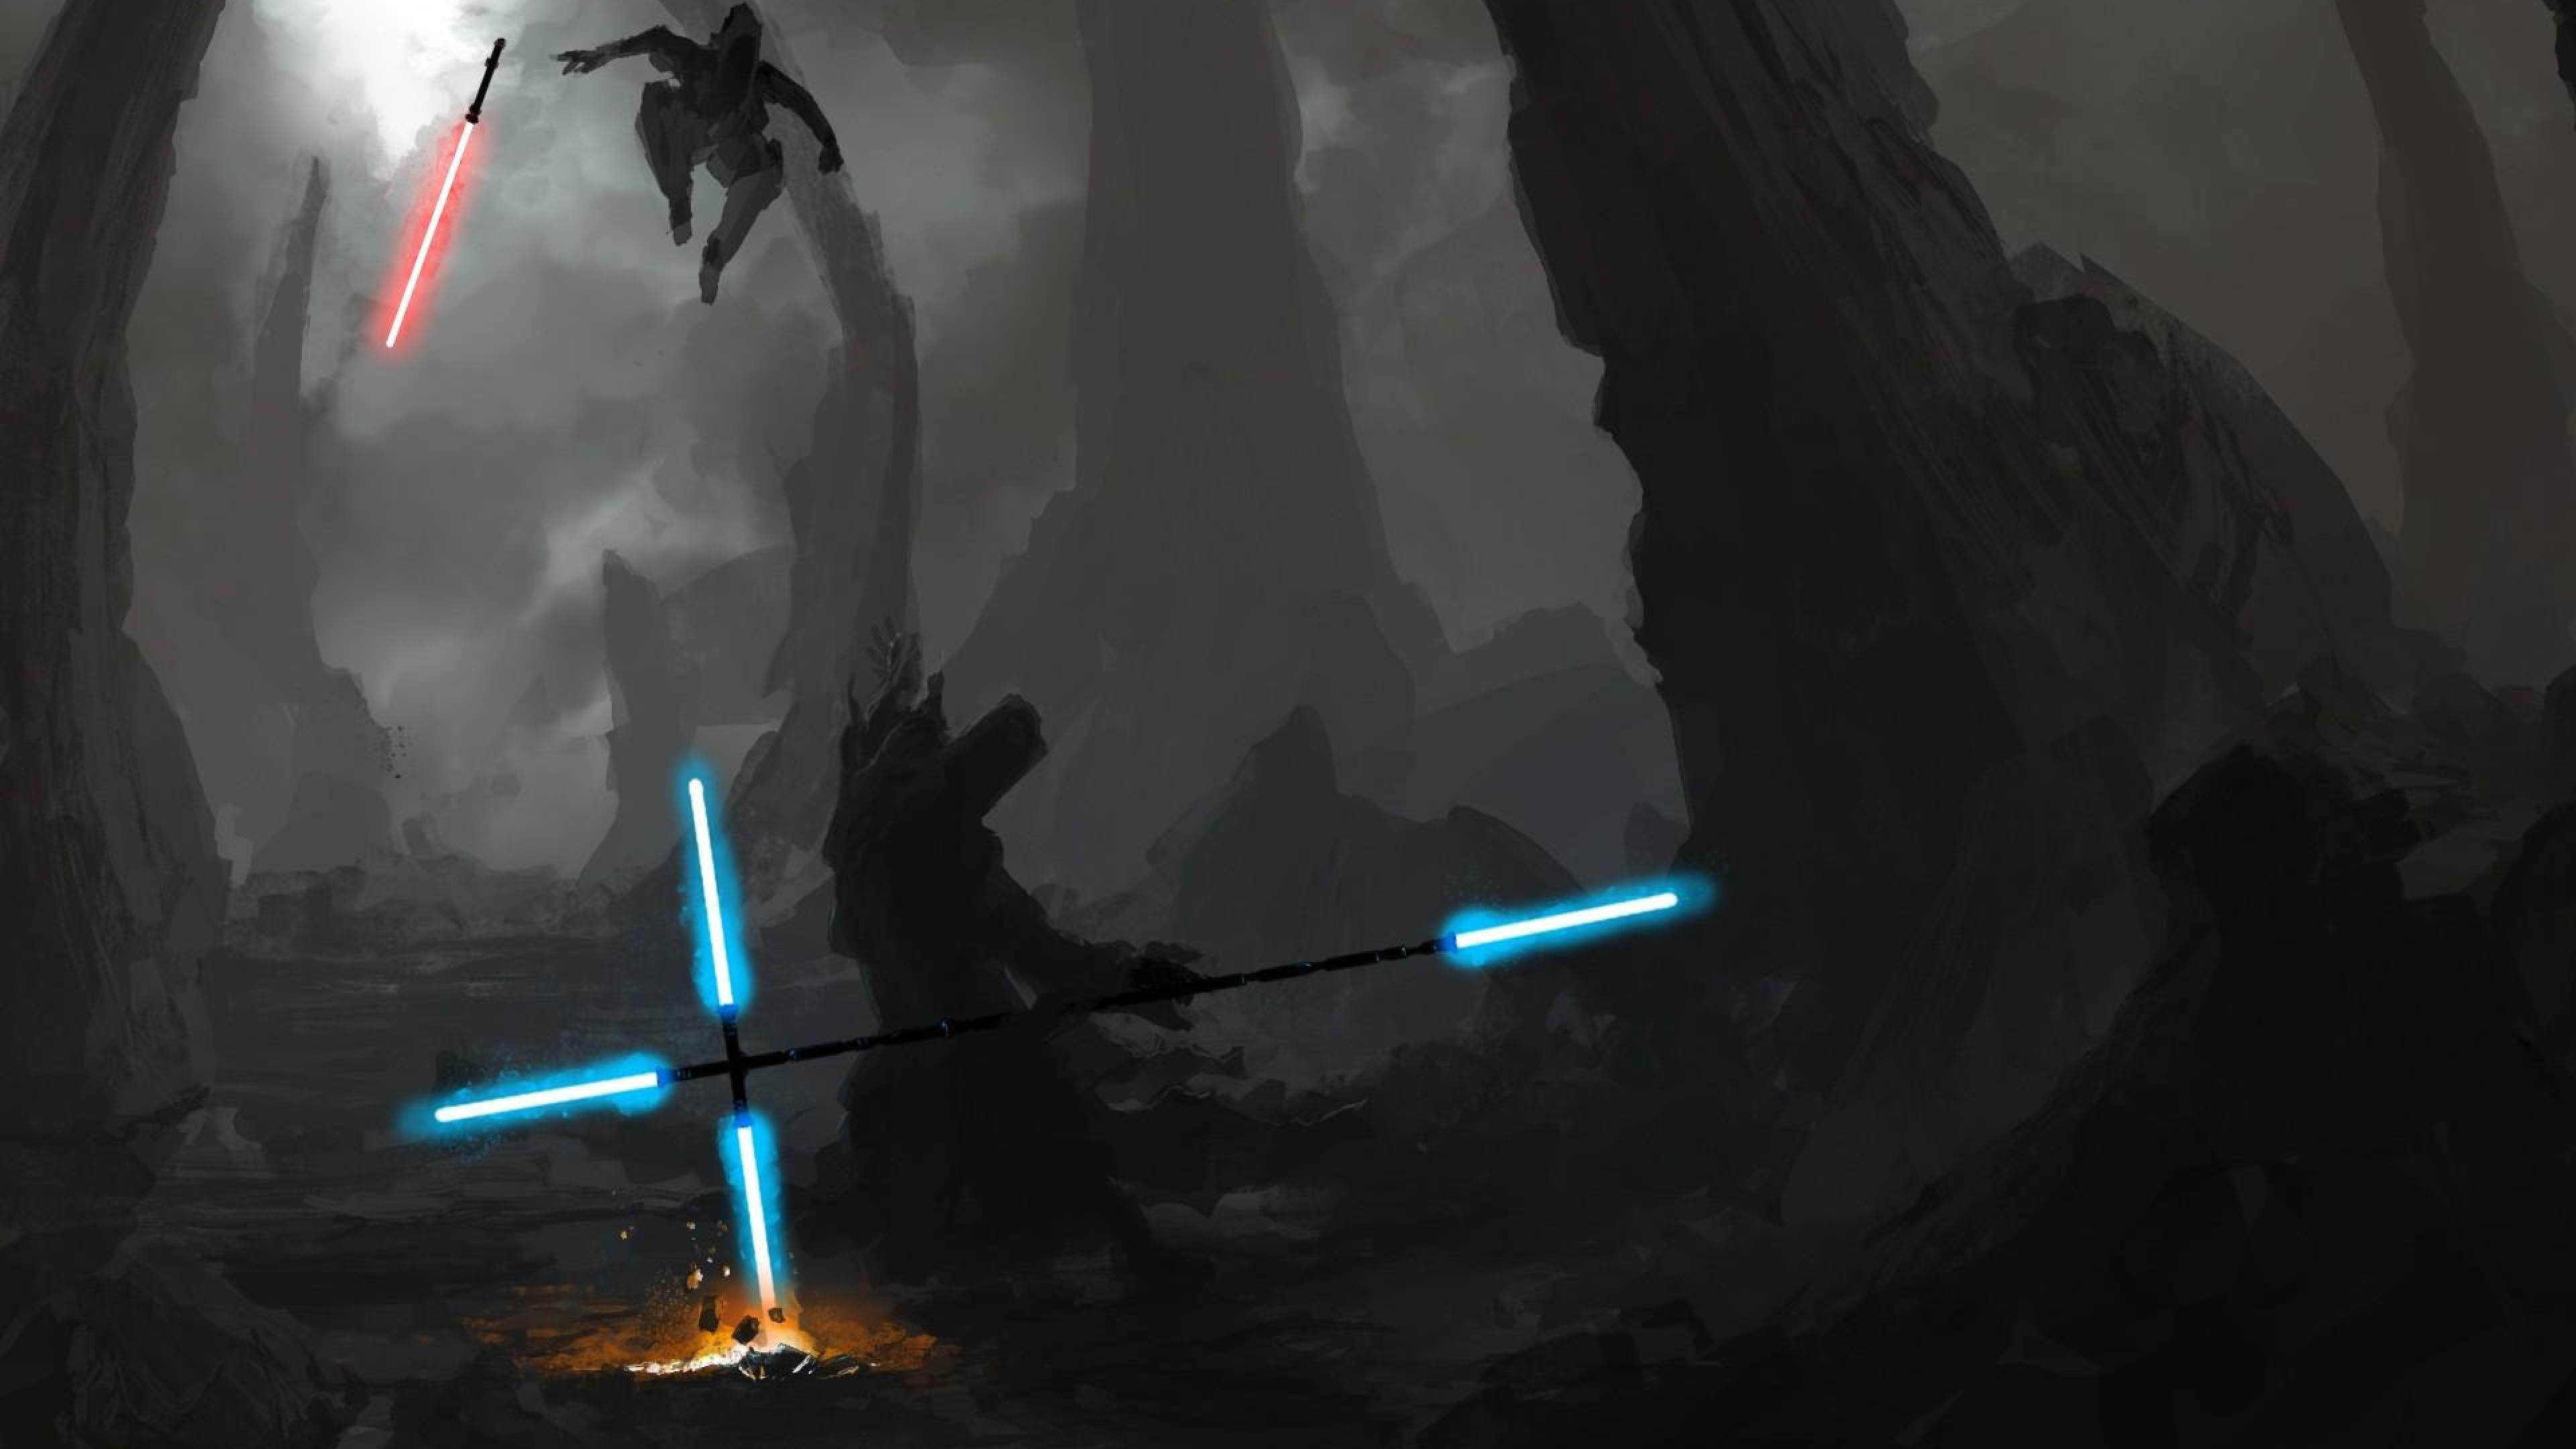 star wars the force awakens 4k